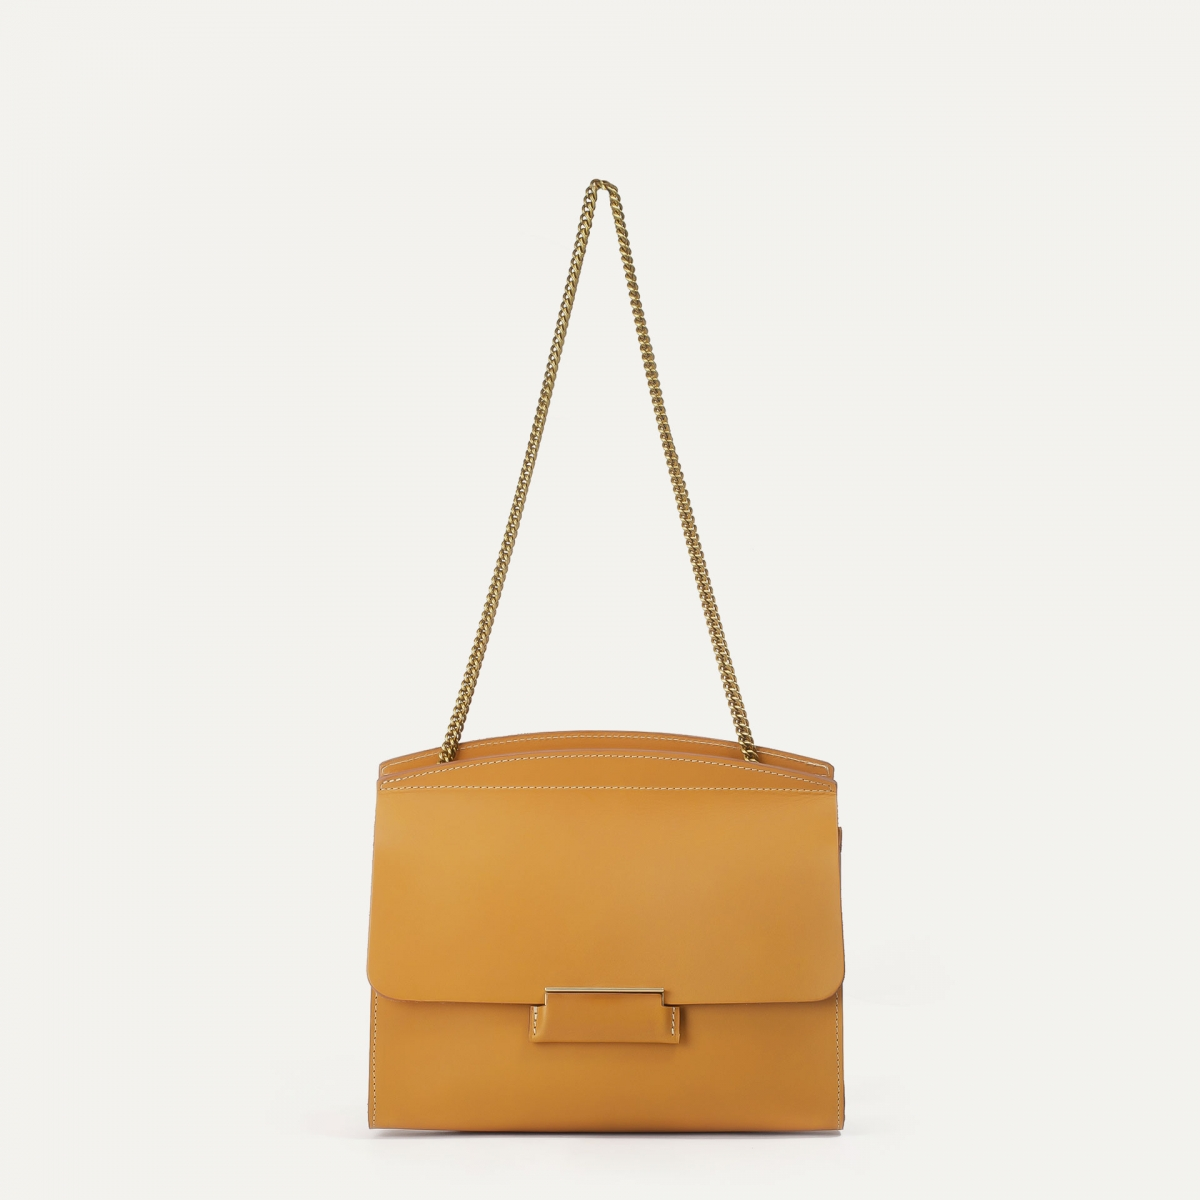 Origami S clutch bag - Honey (image n°1)